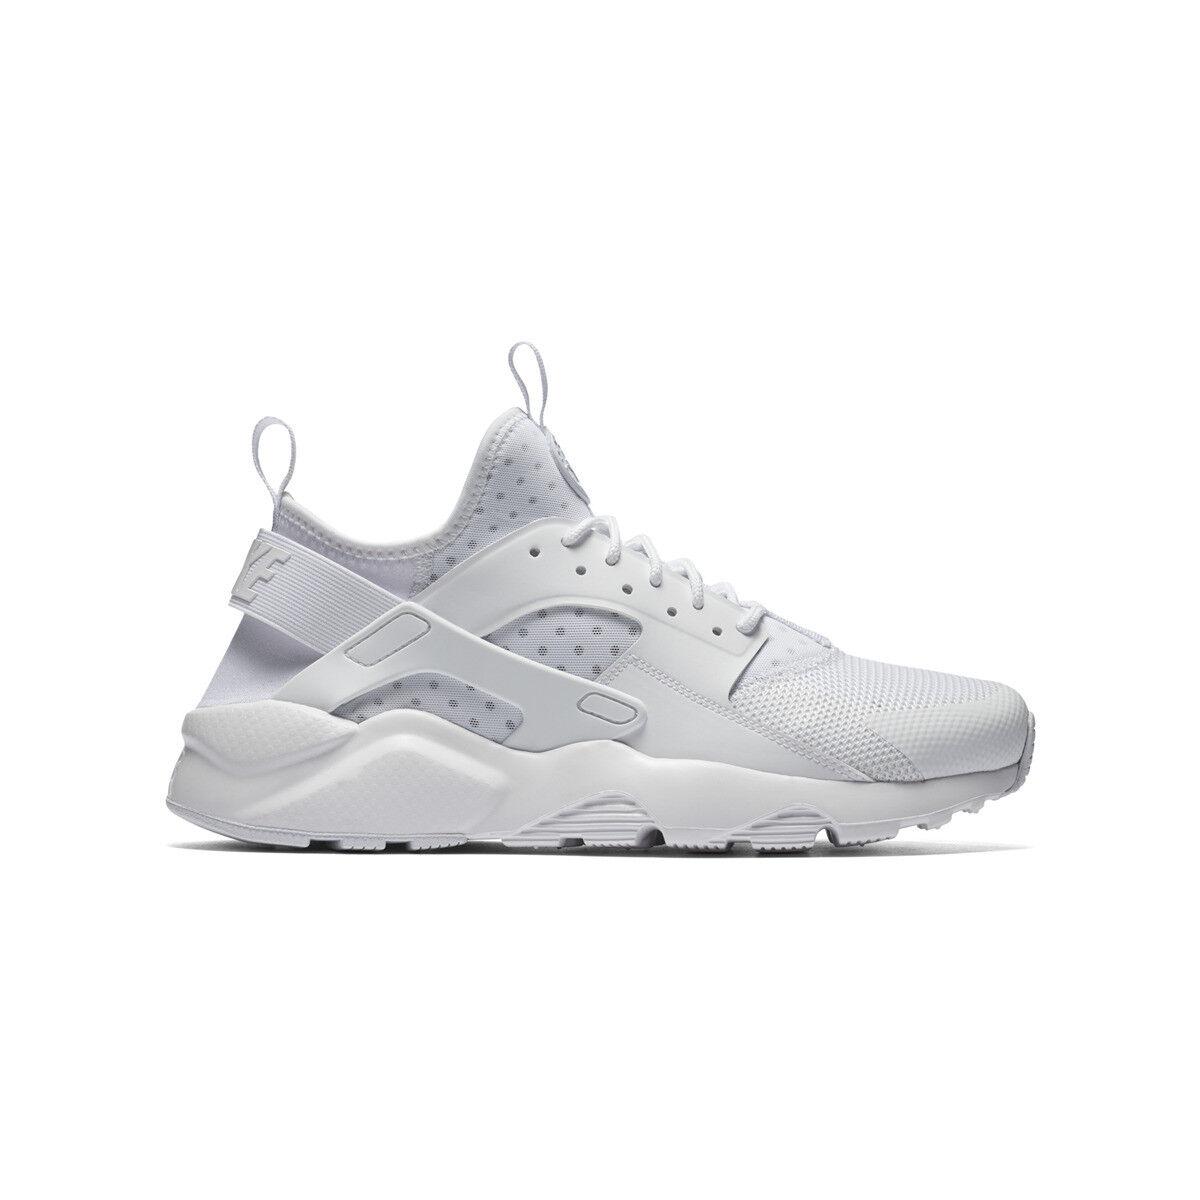 buy popular 15724 1ea3a Blanc Casual Ultra Huarache Chaussures Nike Run 45 Ebay Homme Air 0fnwFa4